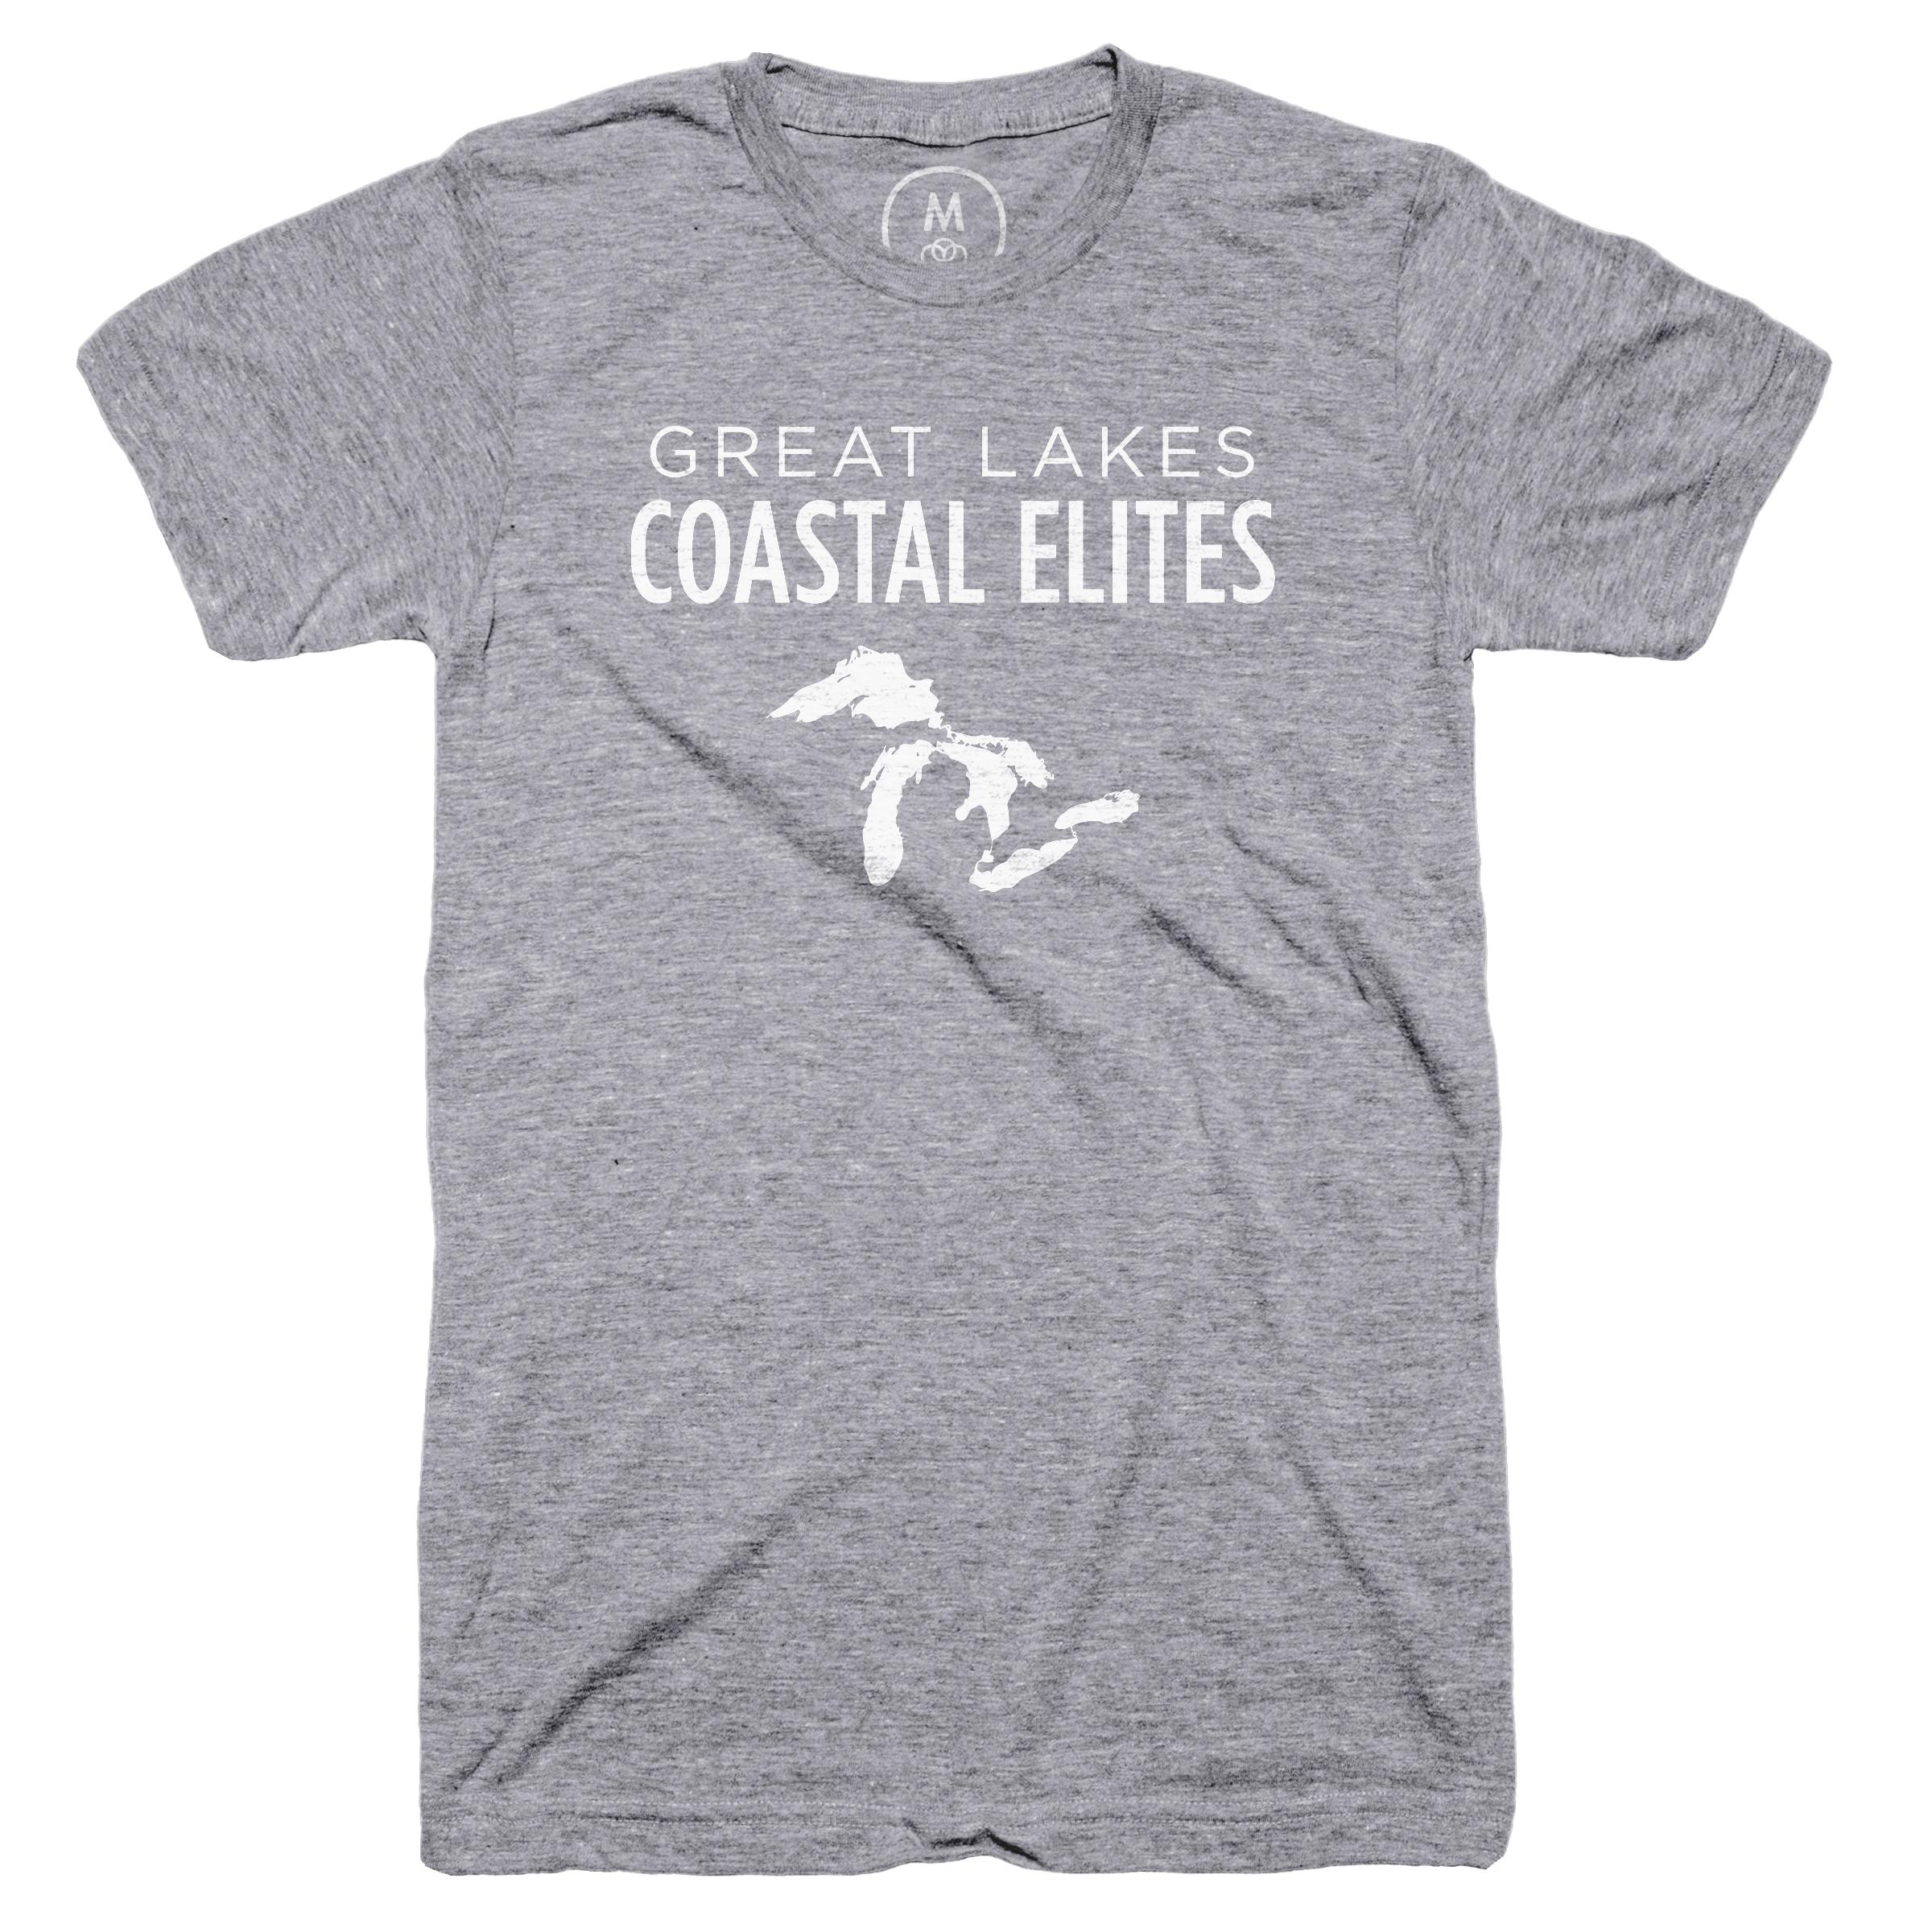 Great Lakes Coastal Elites